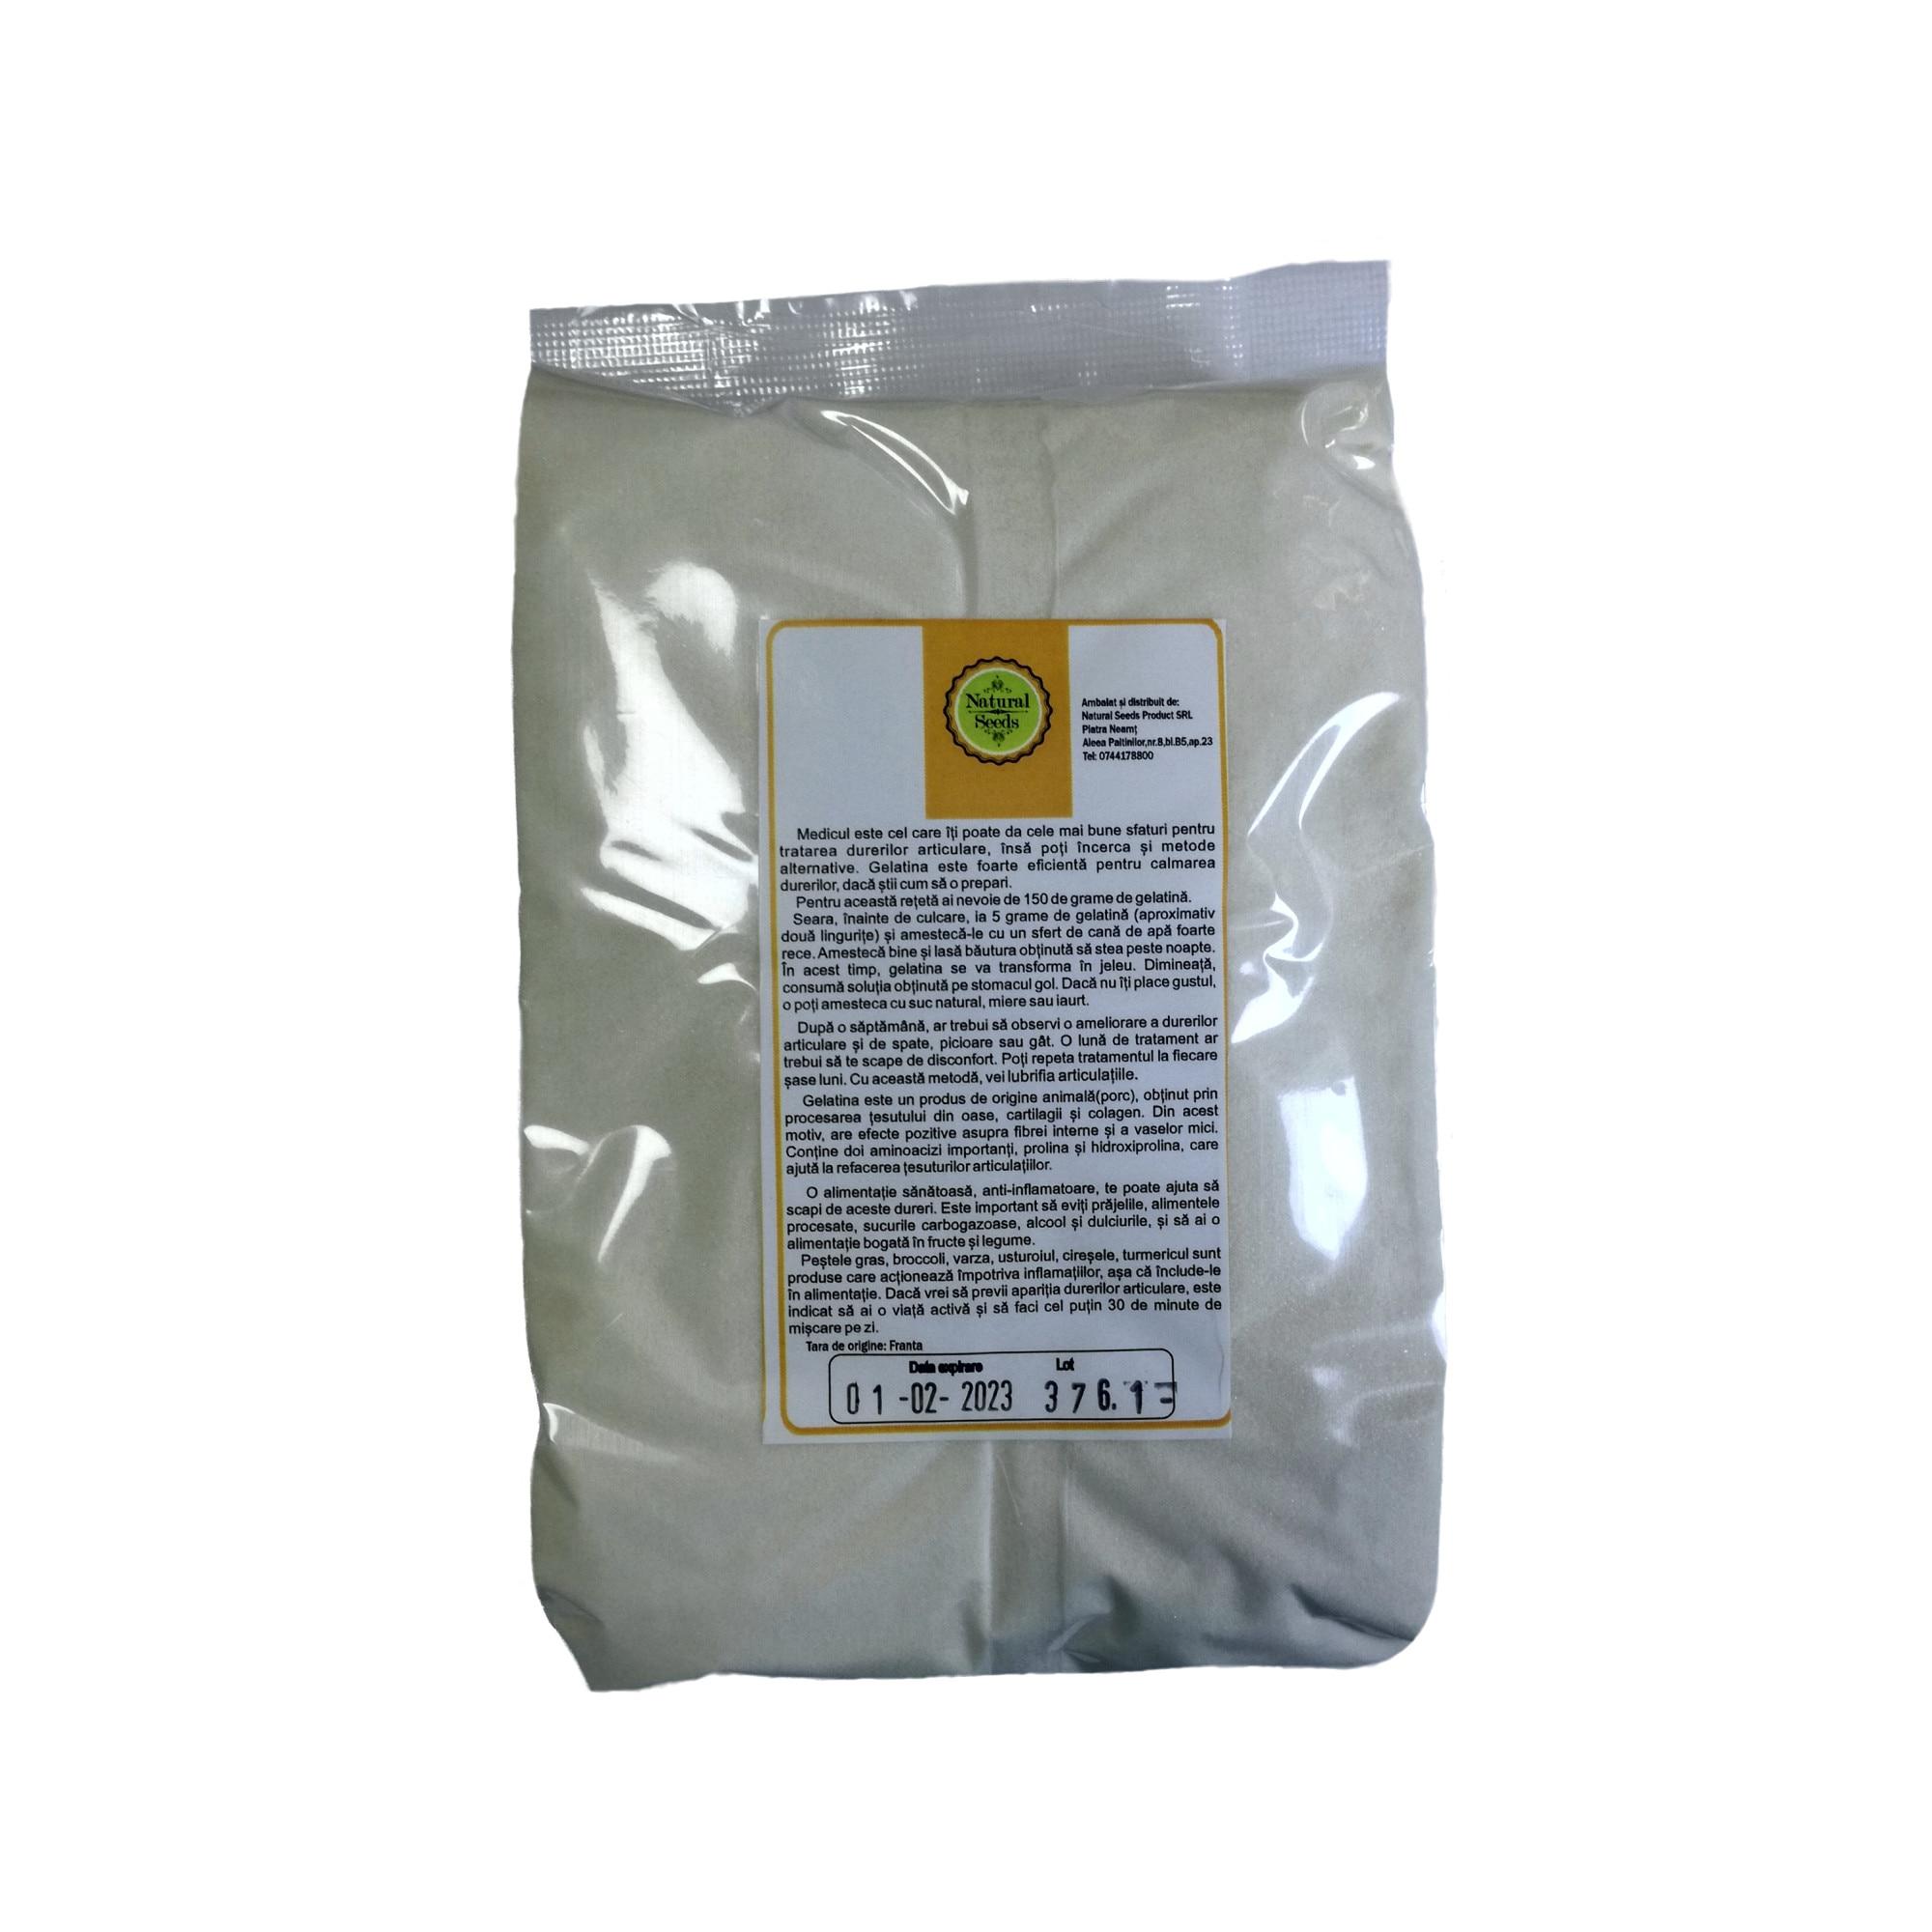 Sanoarticulatii - Gelatina Alimentara gr, Natural Seeds Product - blumenonline.ro